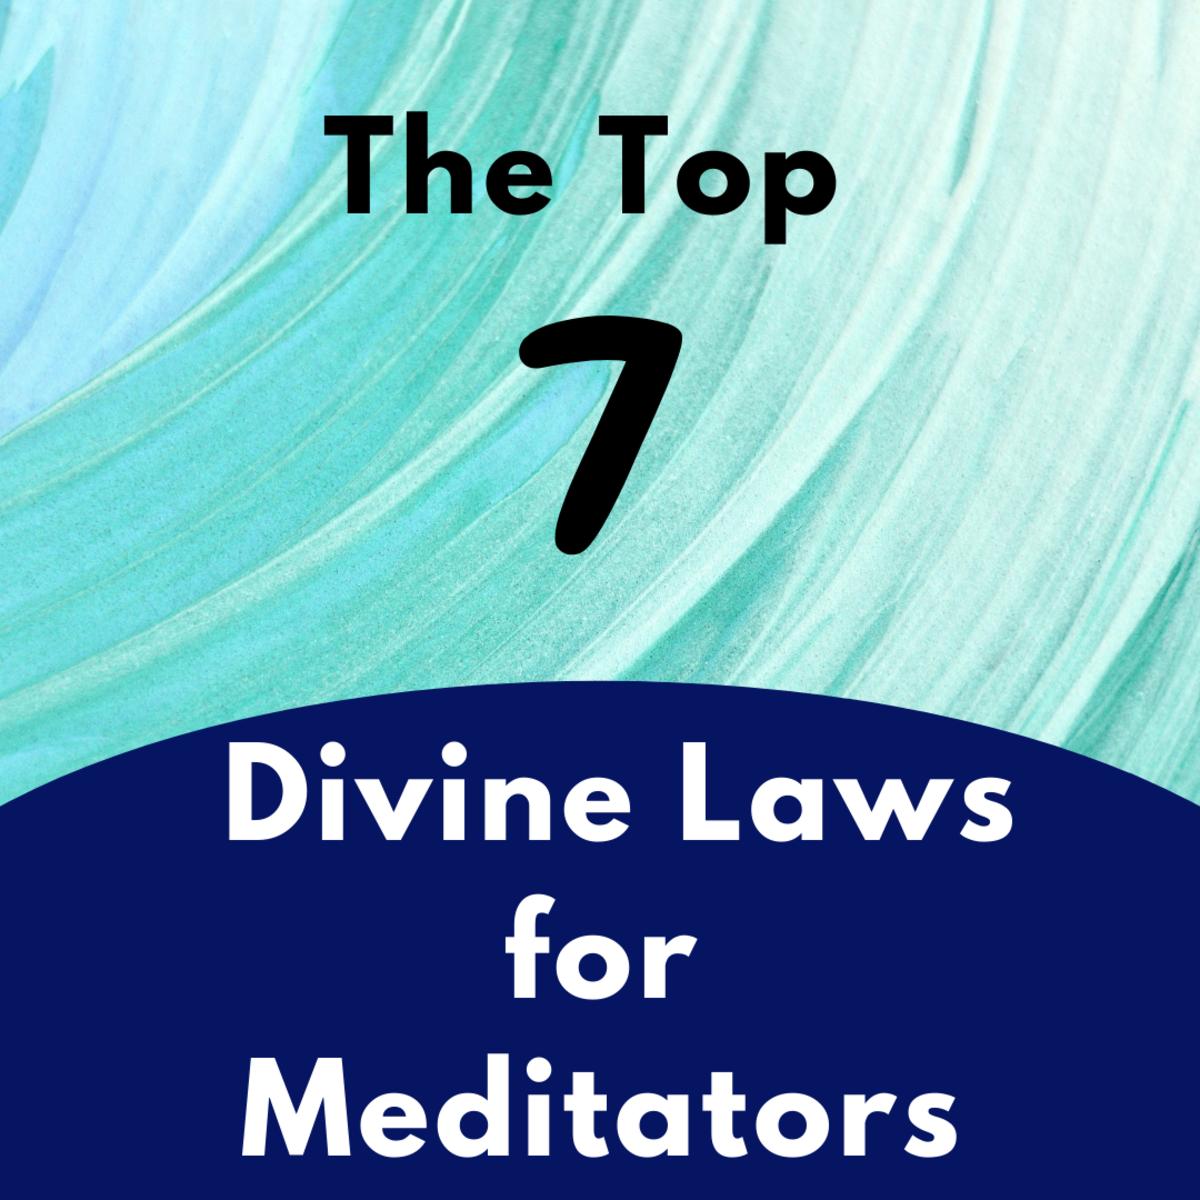 Top 7 divine laws for meditators